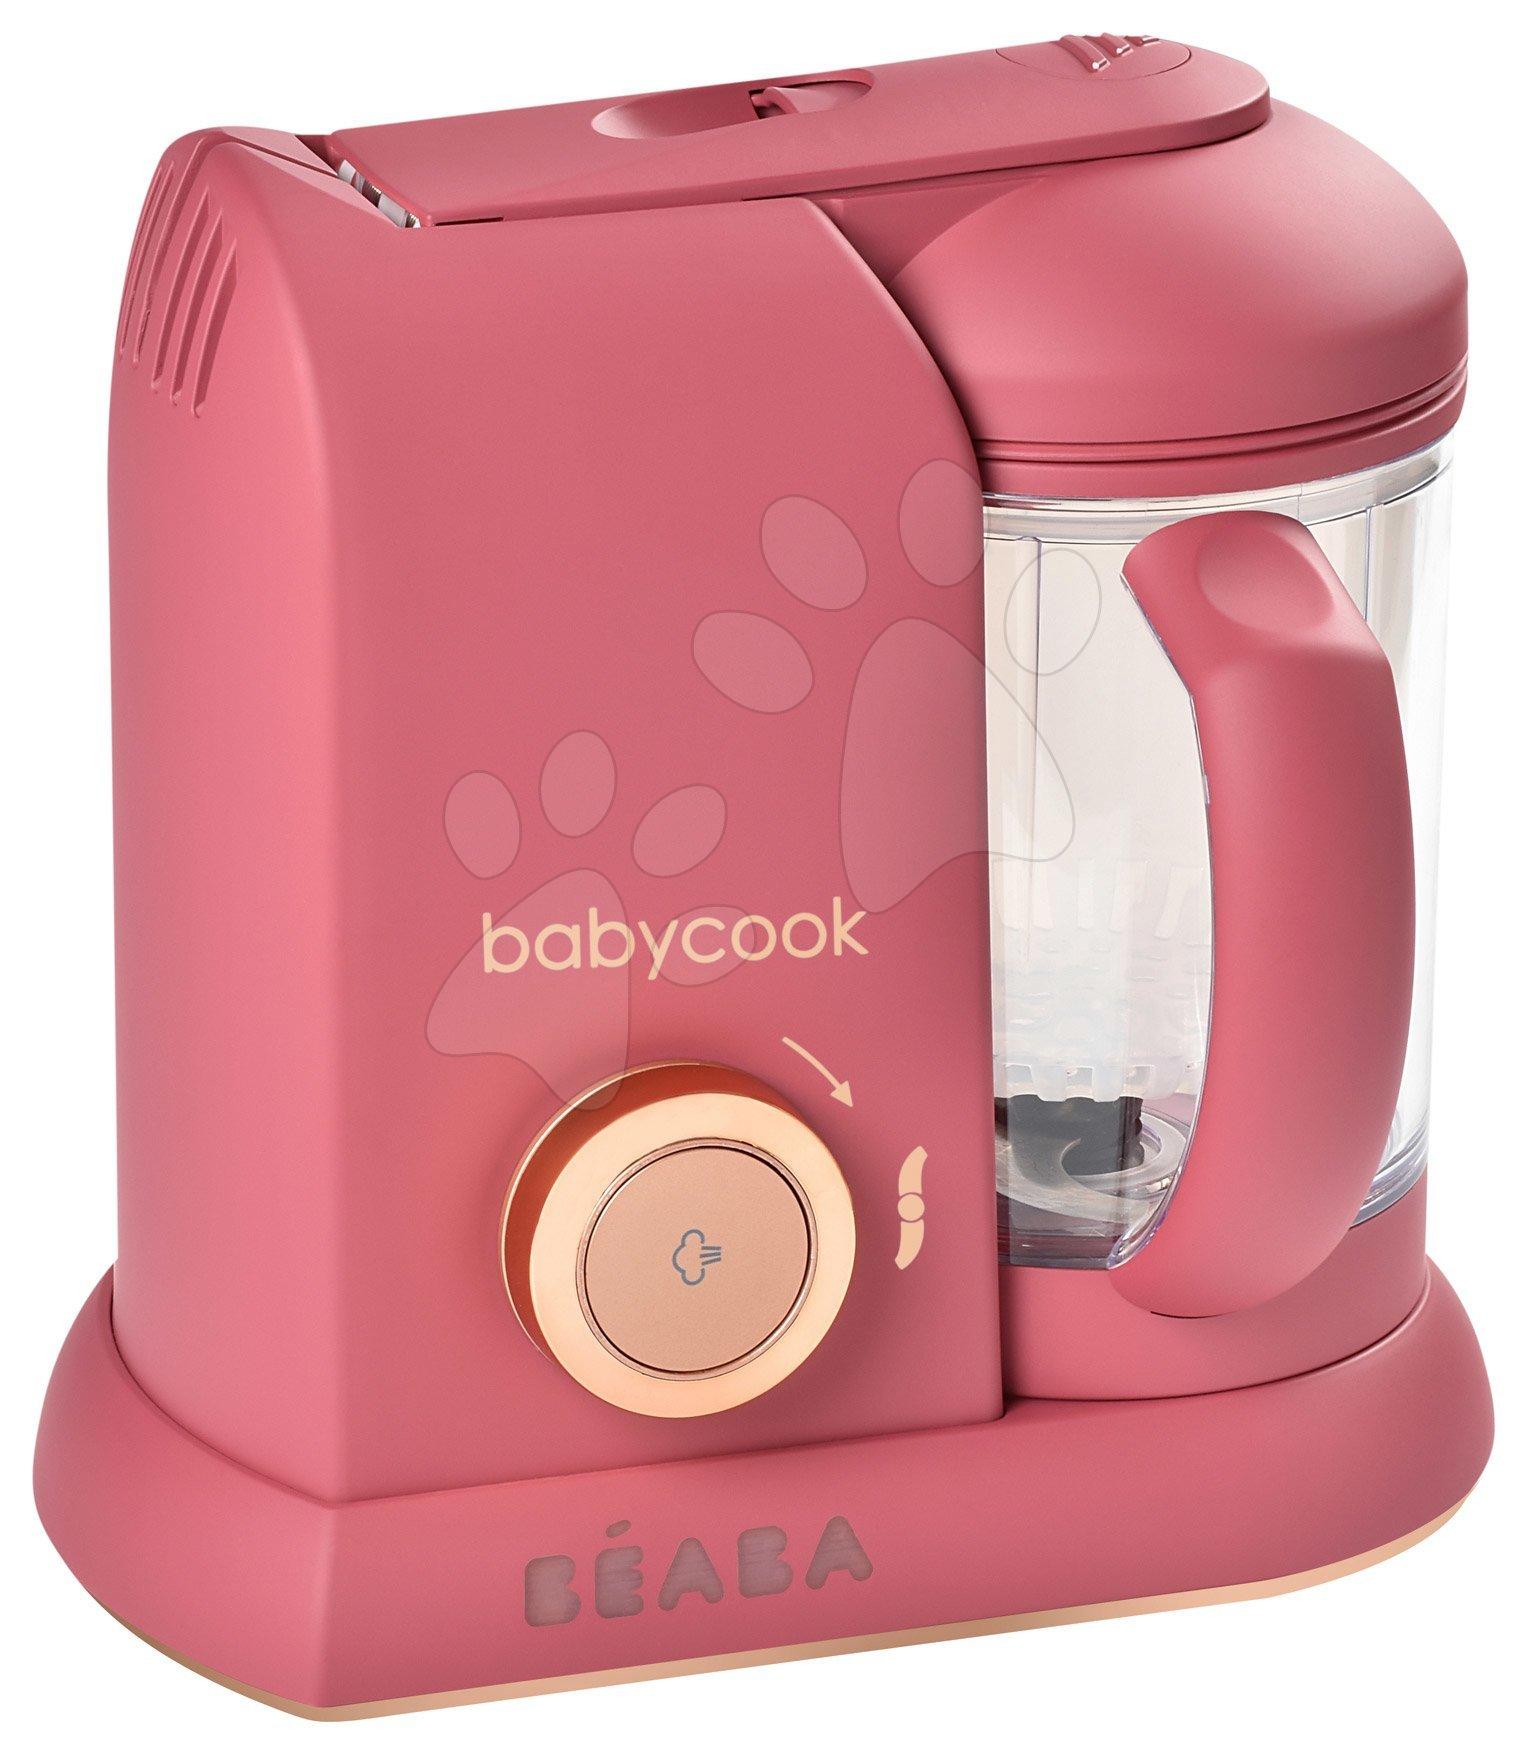 Parný varič a mixér Beaba Babycook® Solo Litchee pink-gold od 0 mes